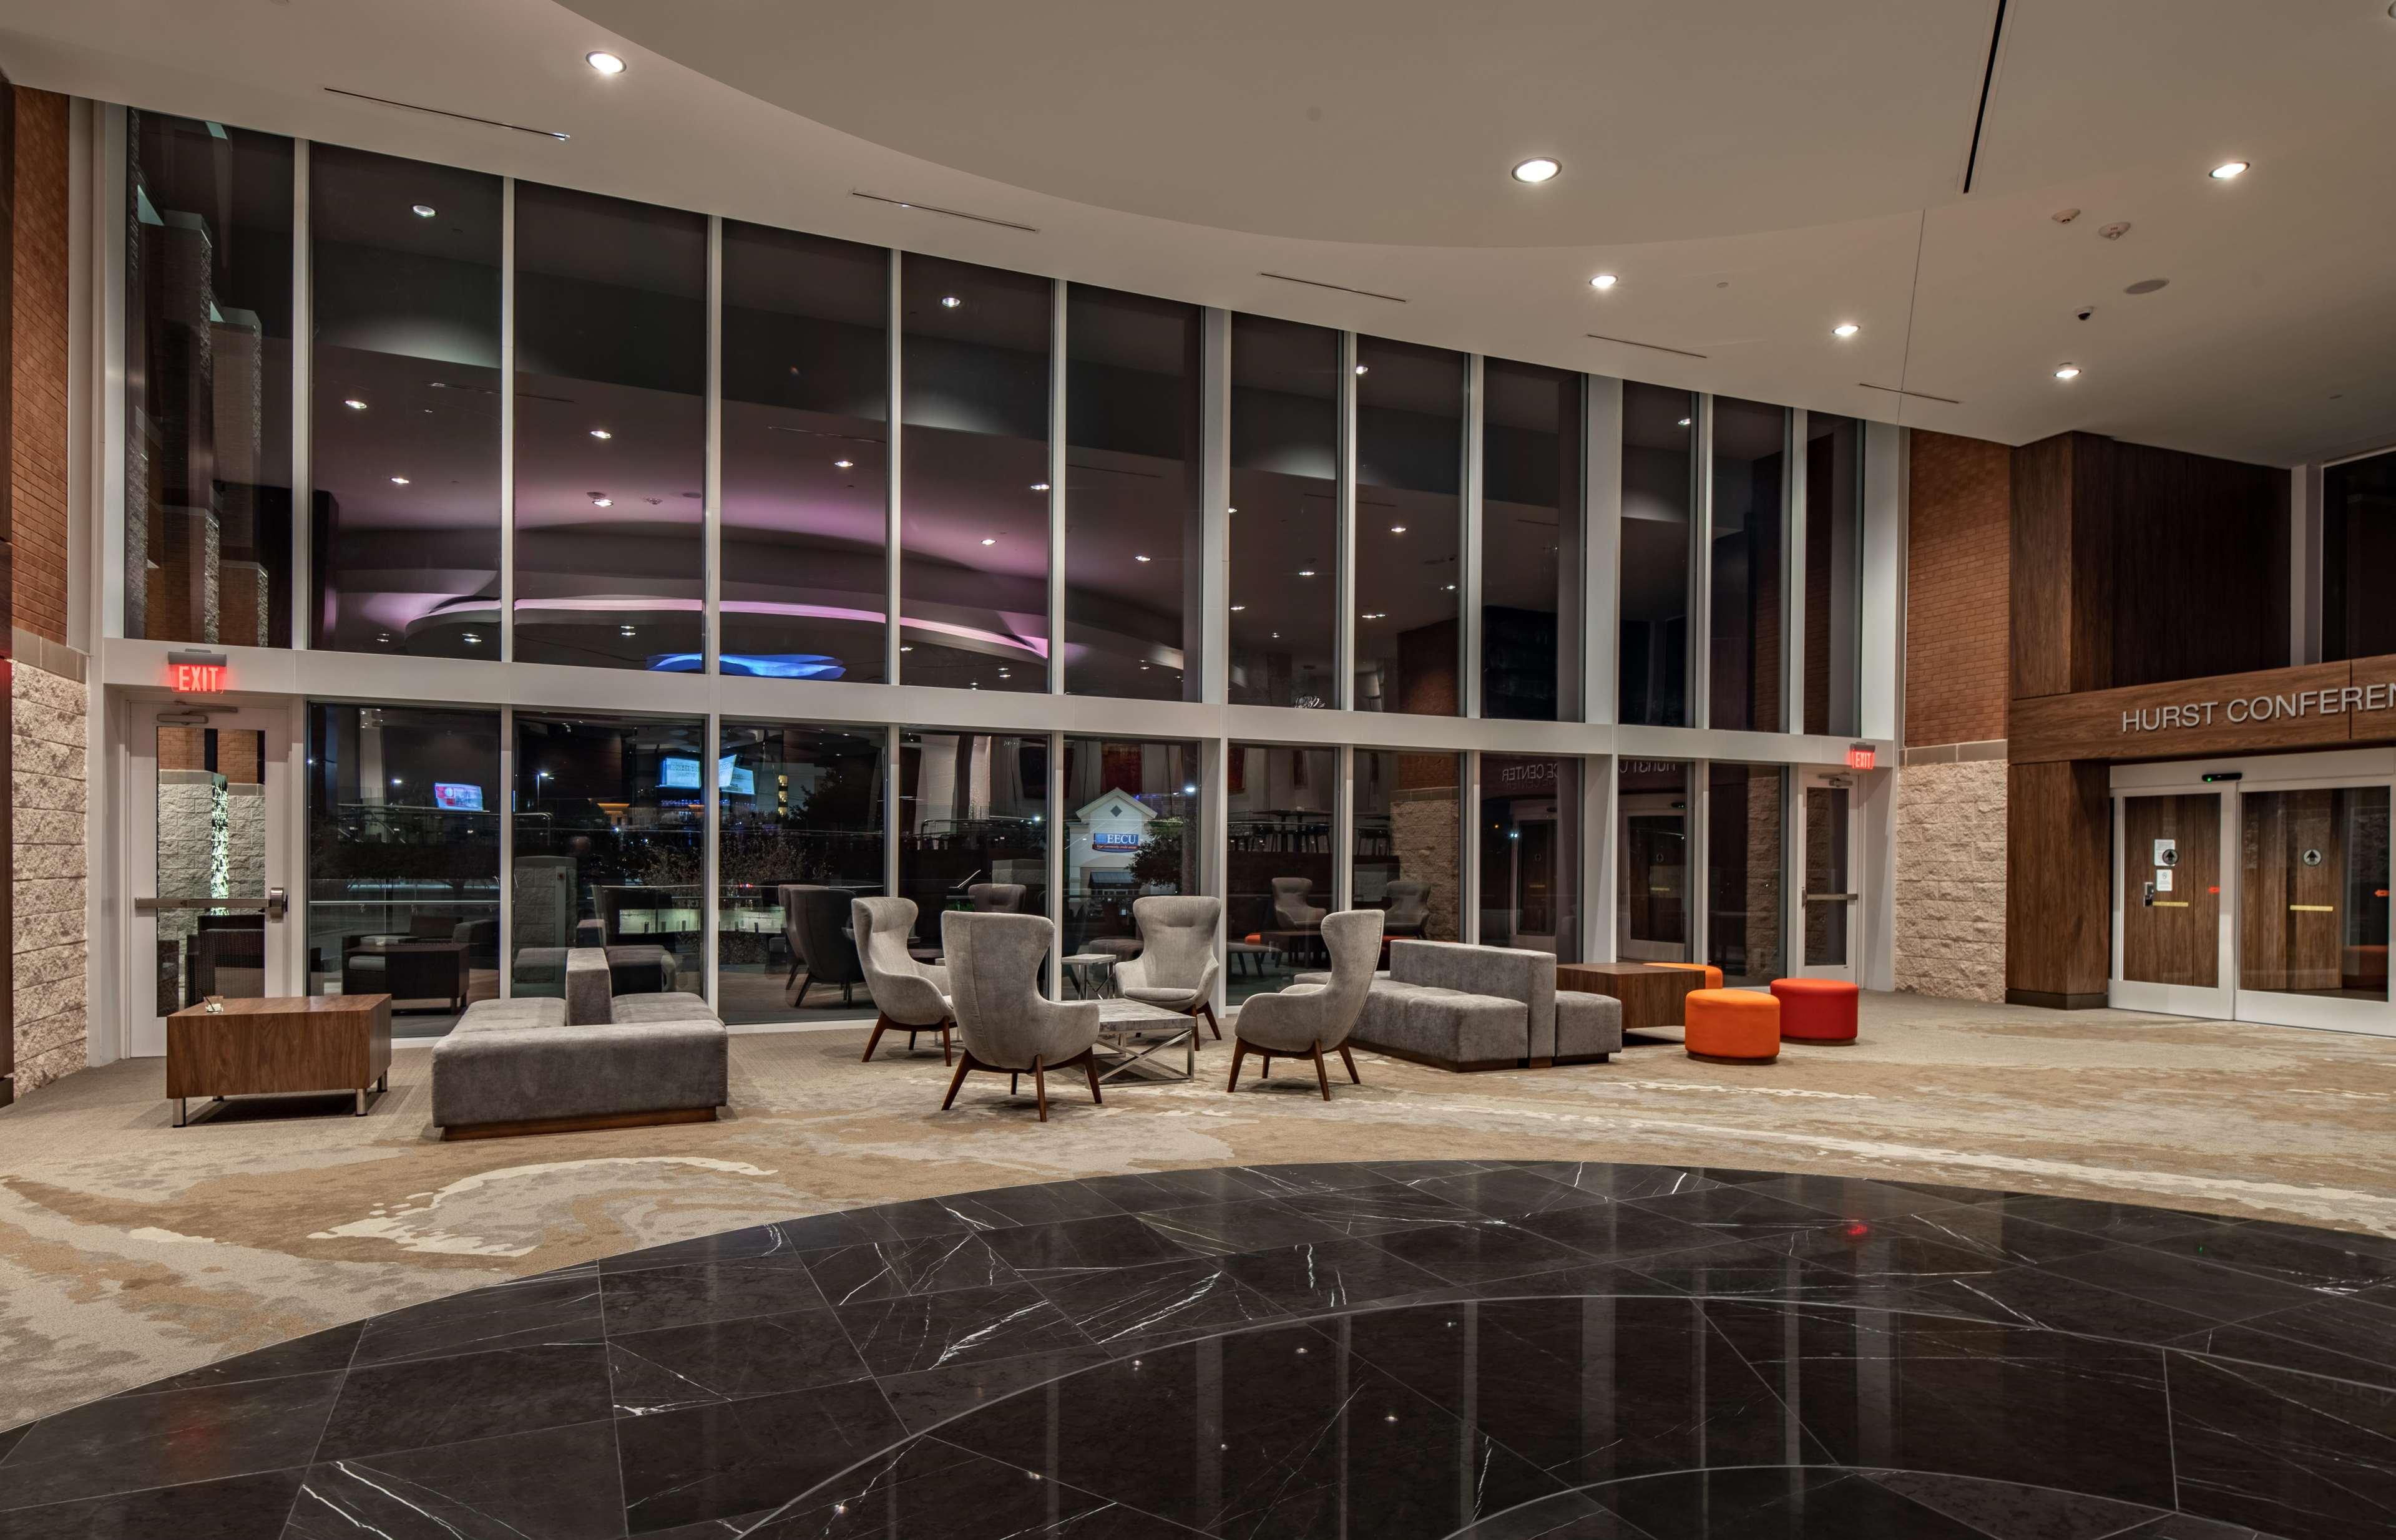 Hilton Garden Inn Dallas at Hurst Conference Center image 7